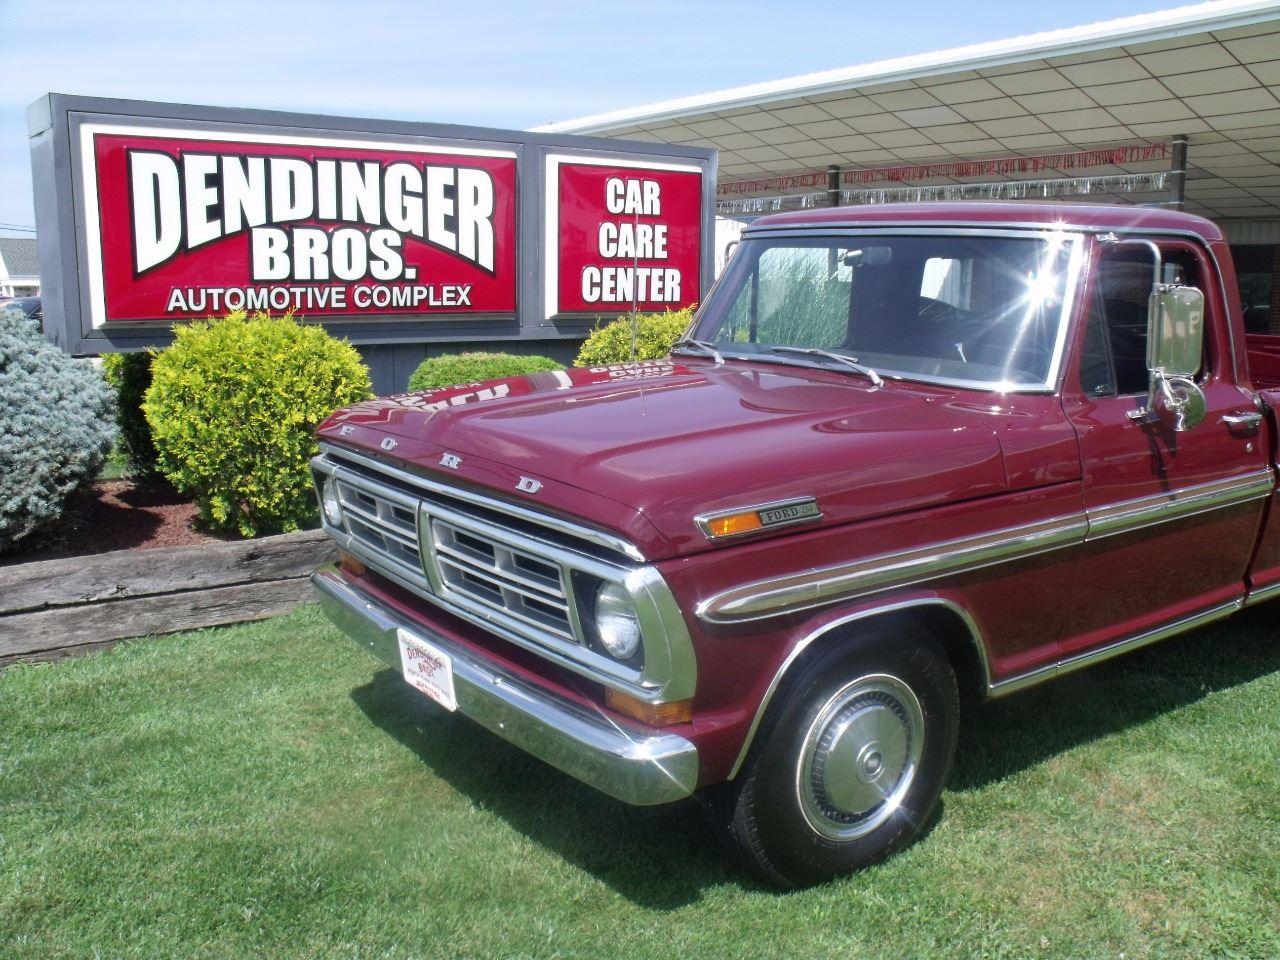 Dendinger Bros Auto Sales & Service